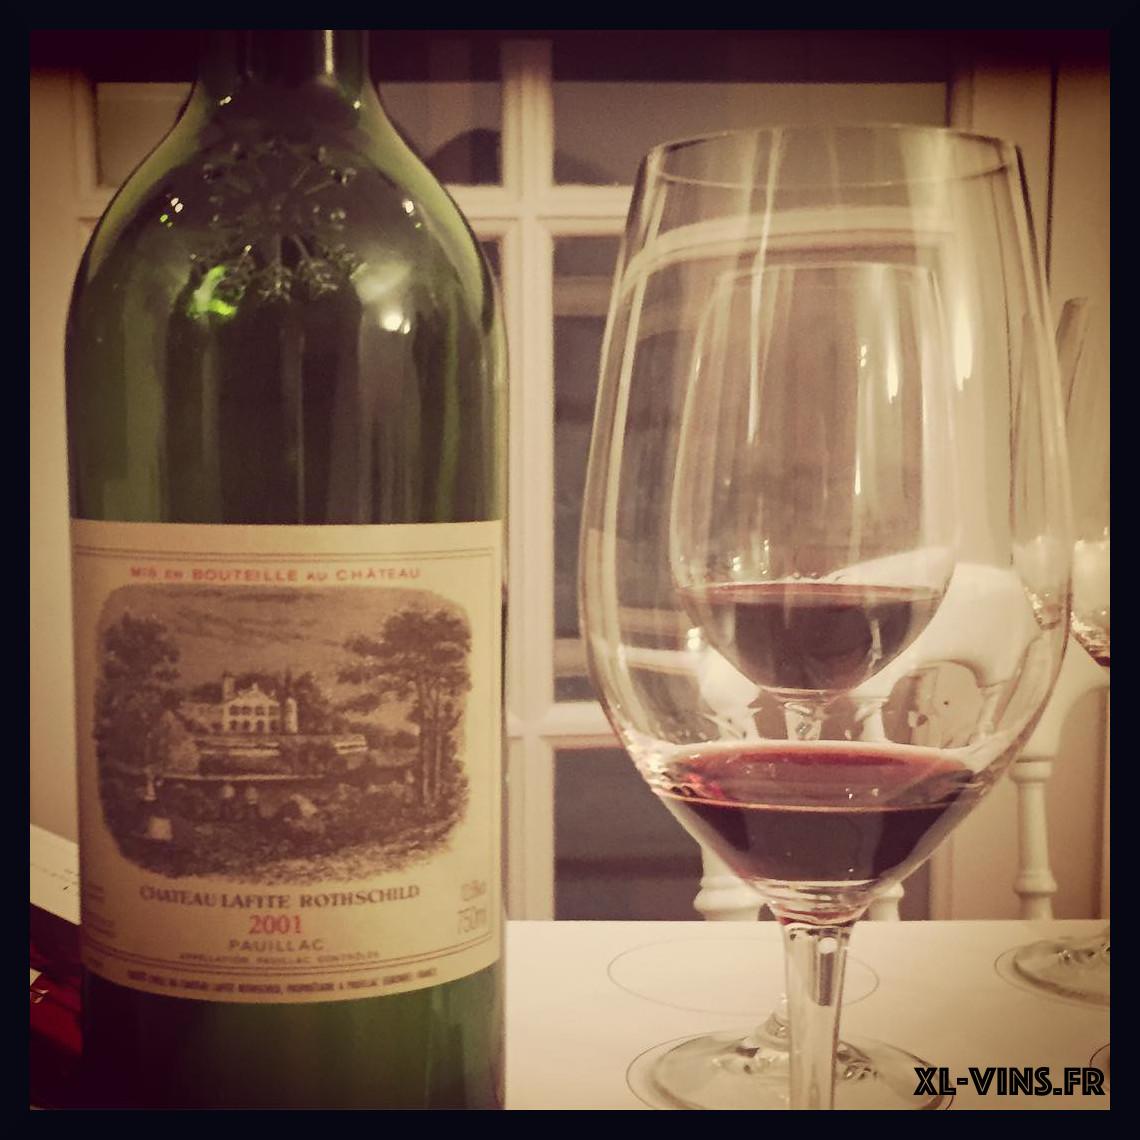 Bordeaux wine tasting 2018 lafite 2001